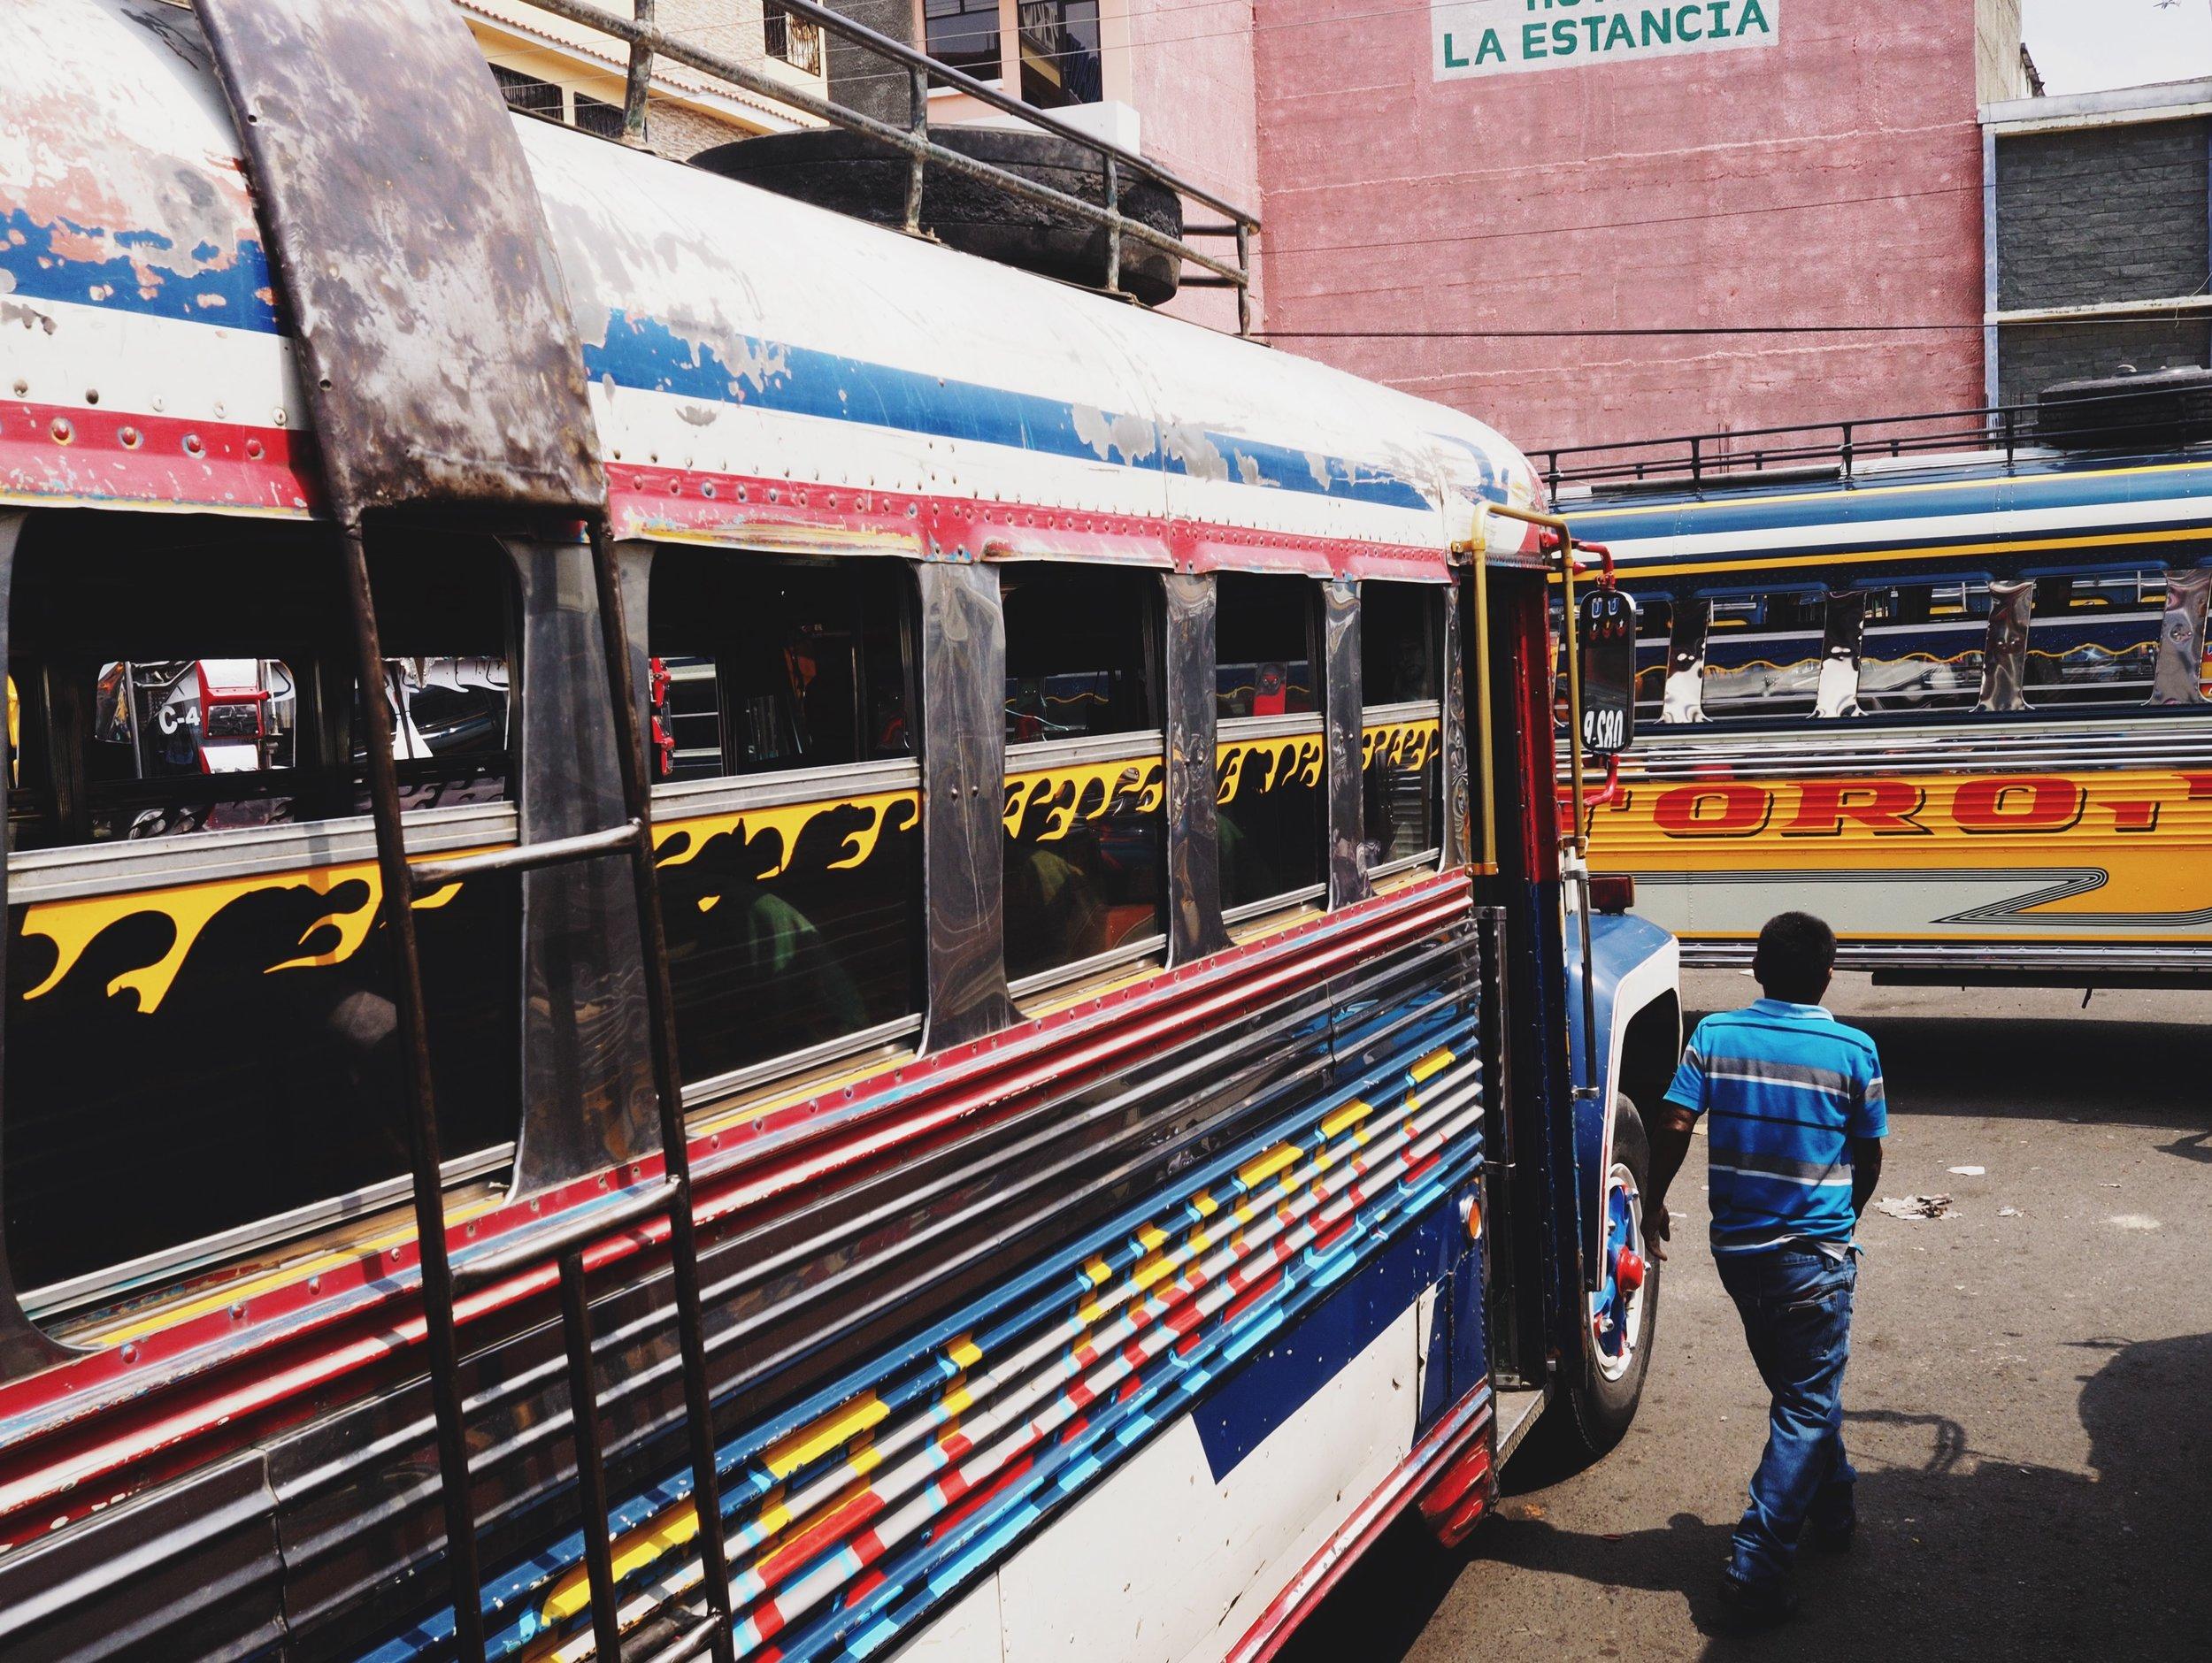 Huehuetenango bus station